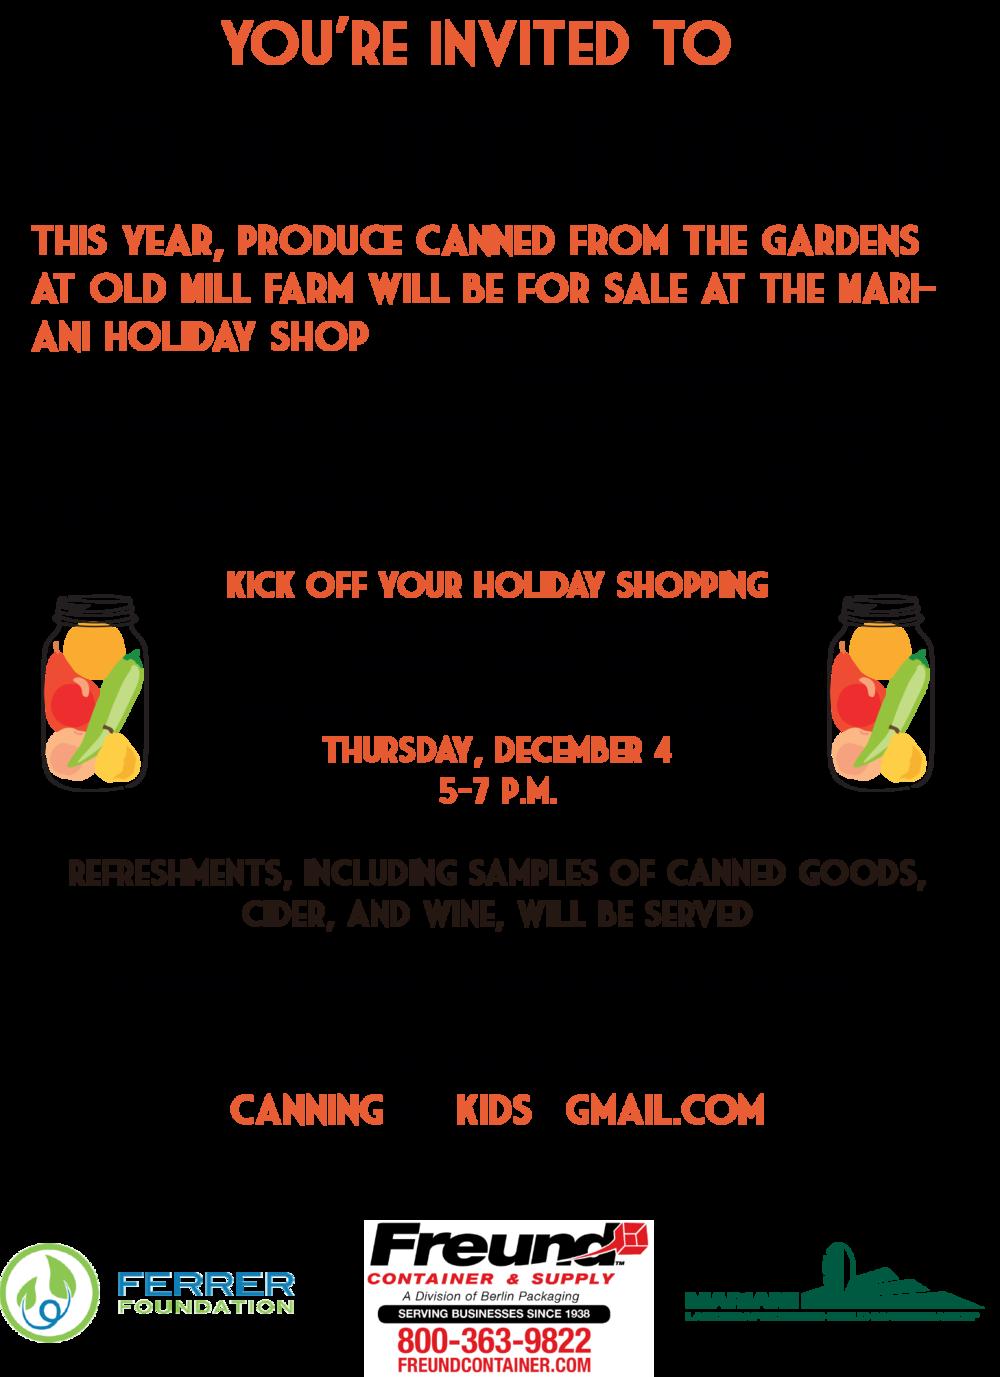 RSVP: canningforkids@gmail.com